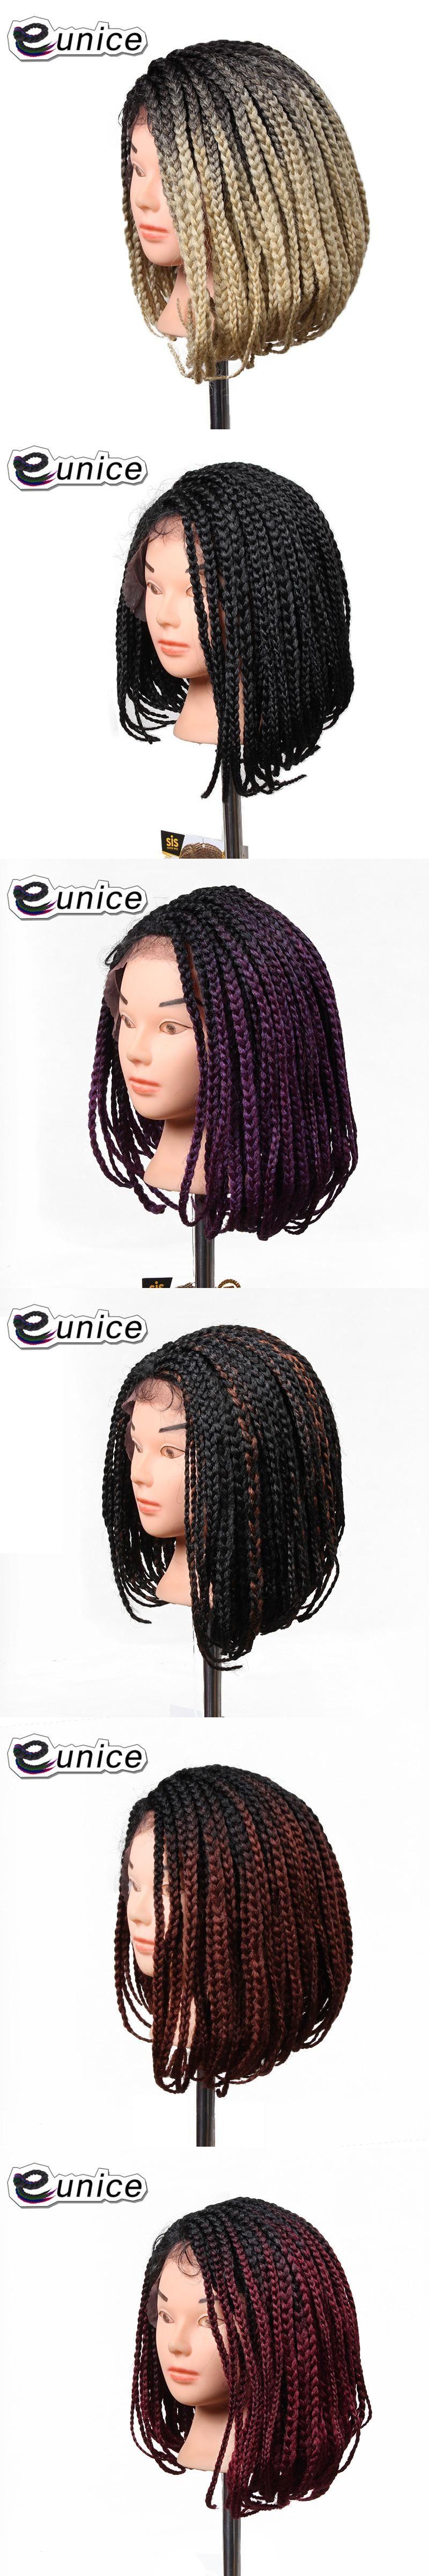 "Fashion 1PC Ombre Synthetic Wig Black BUG Purple 613 14"" Short Bob"